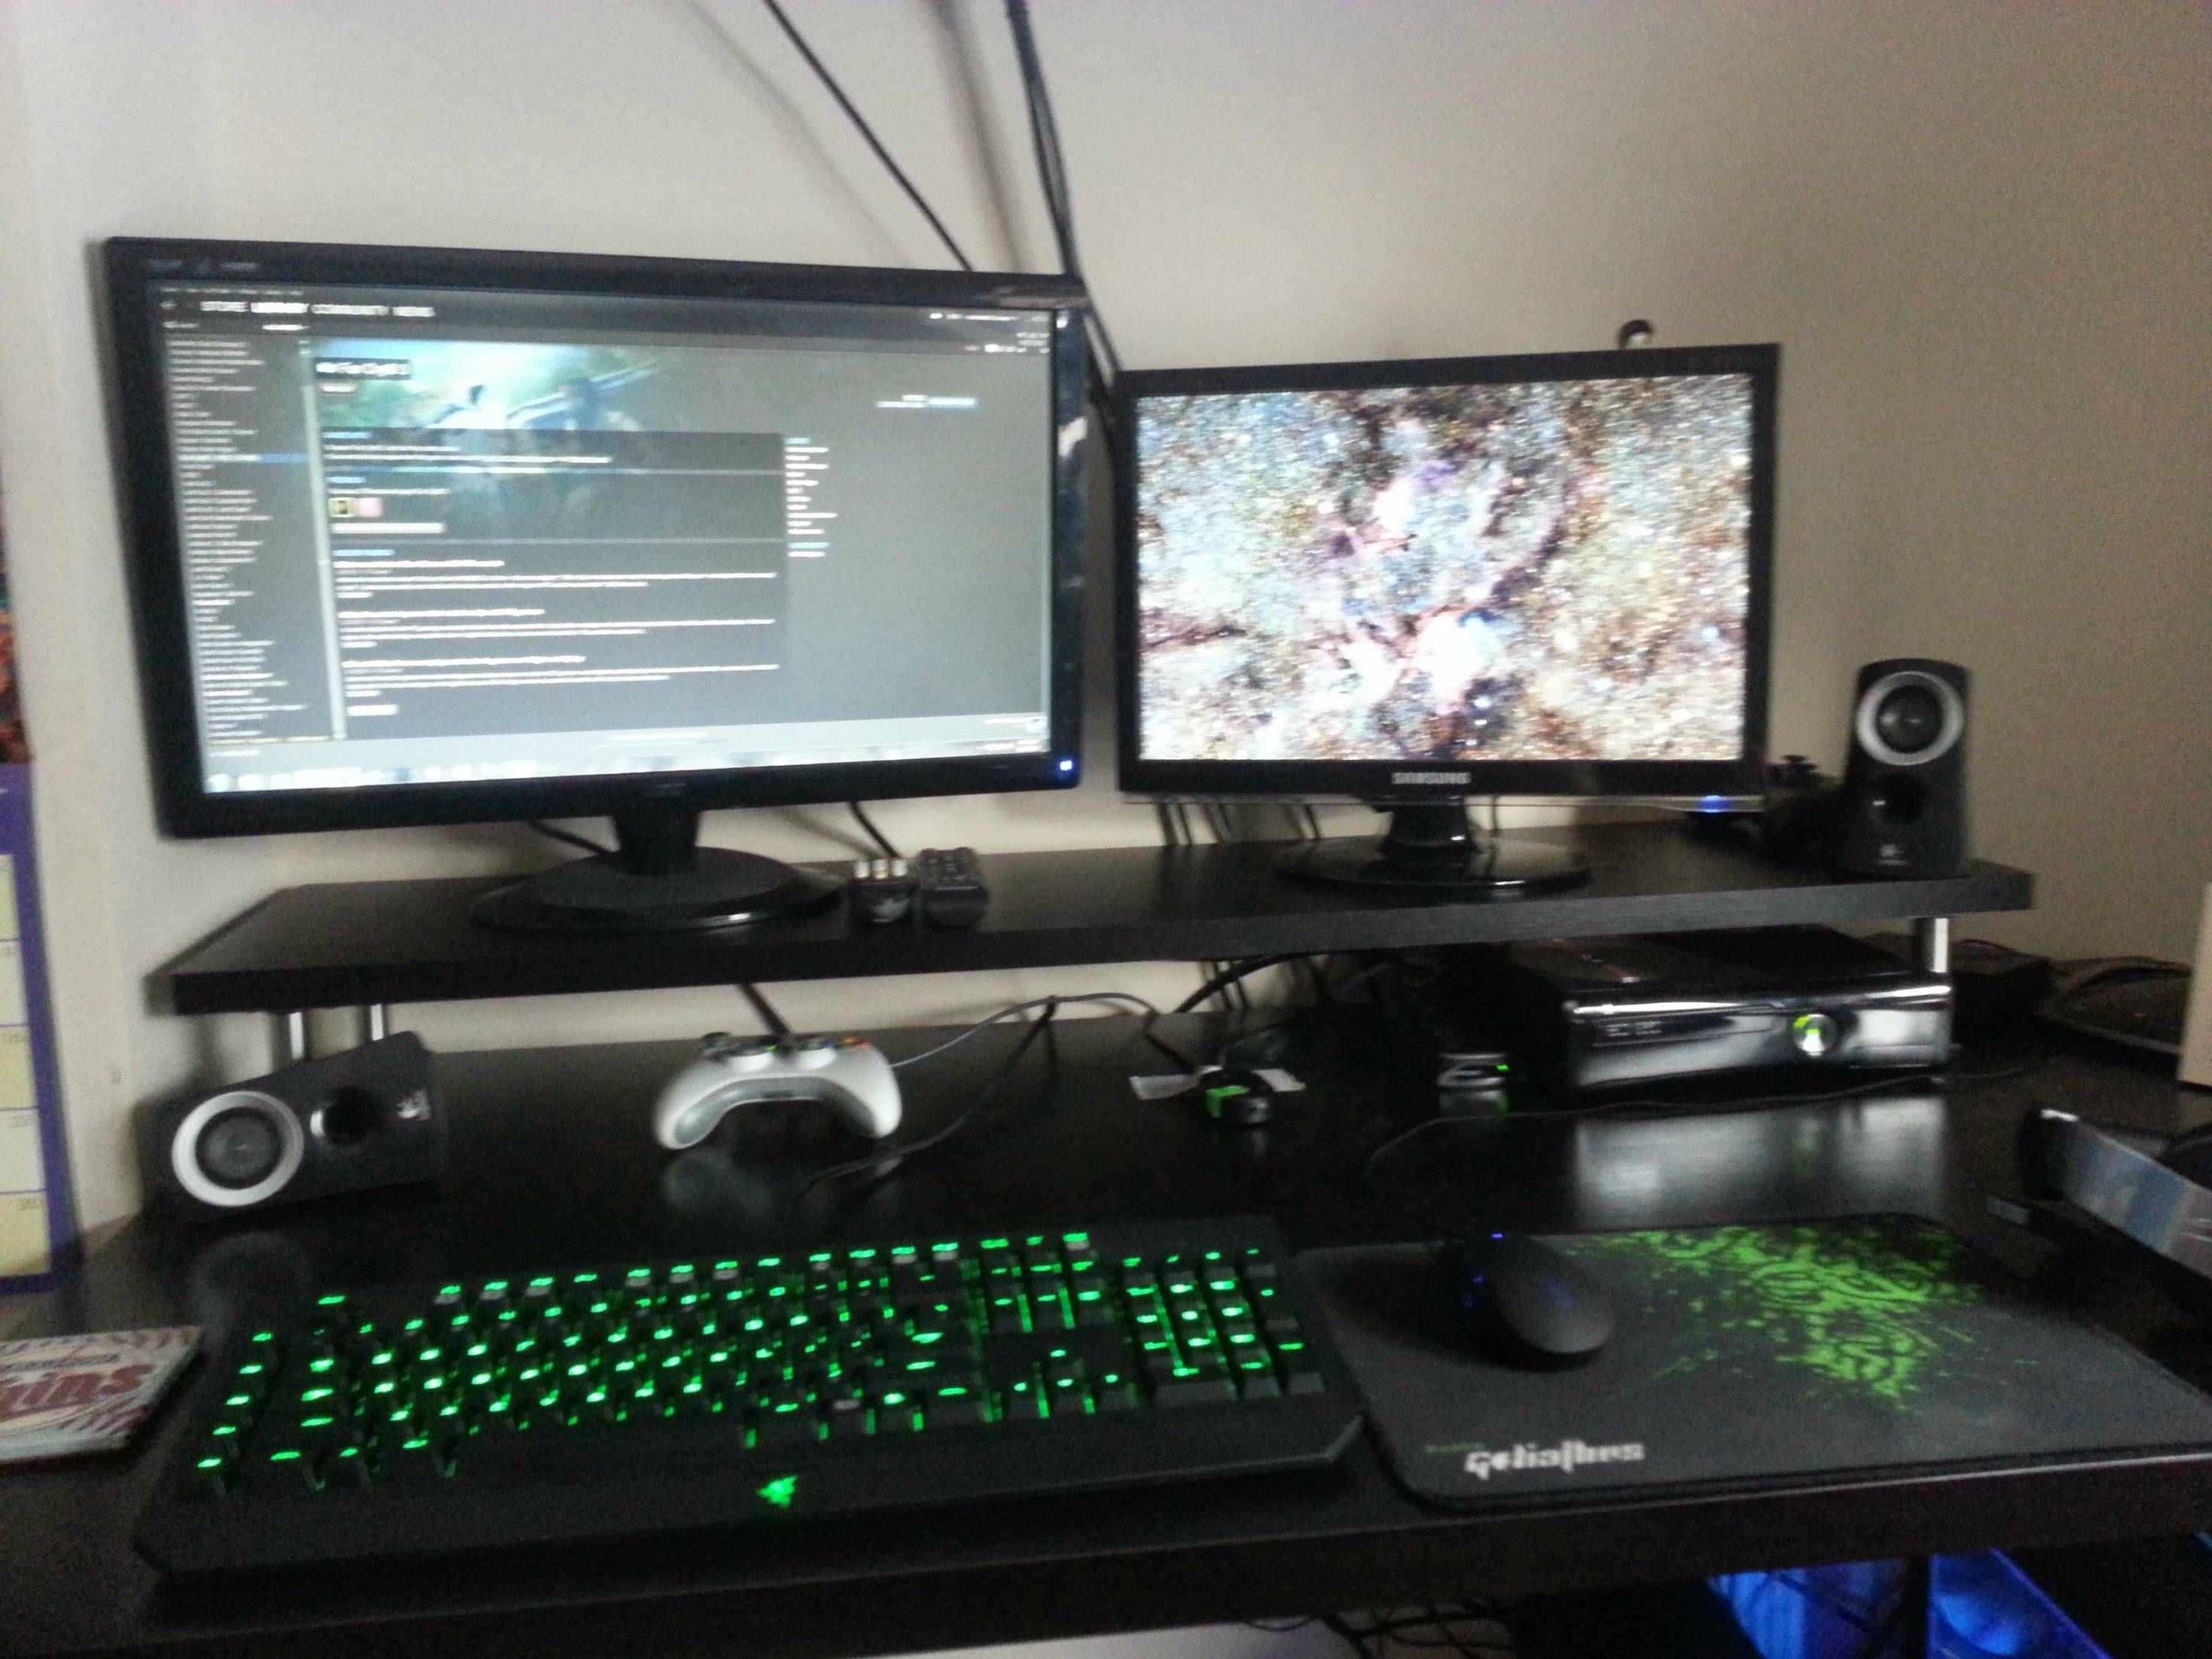 Superieur 15 Remarkable Computer Desks For Gamers Image Ideas